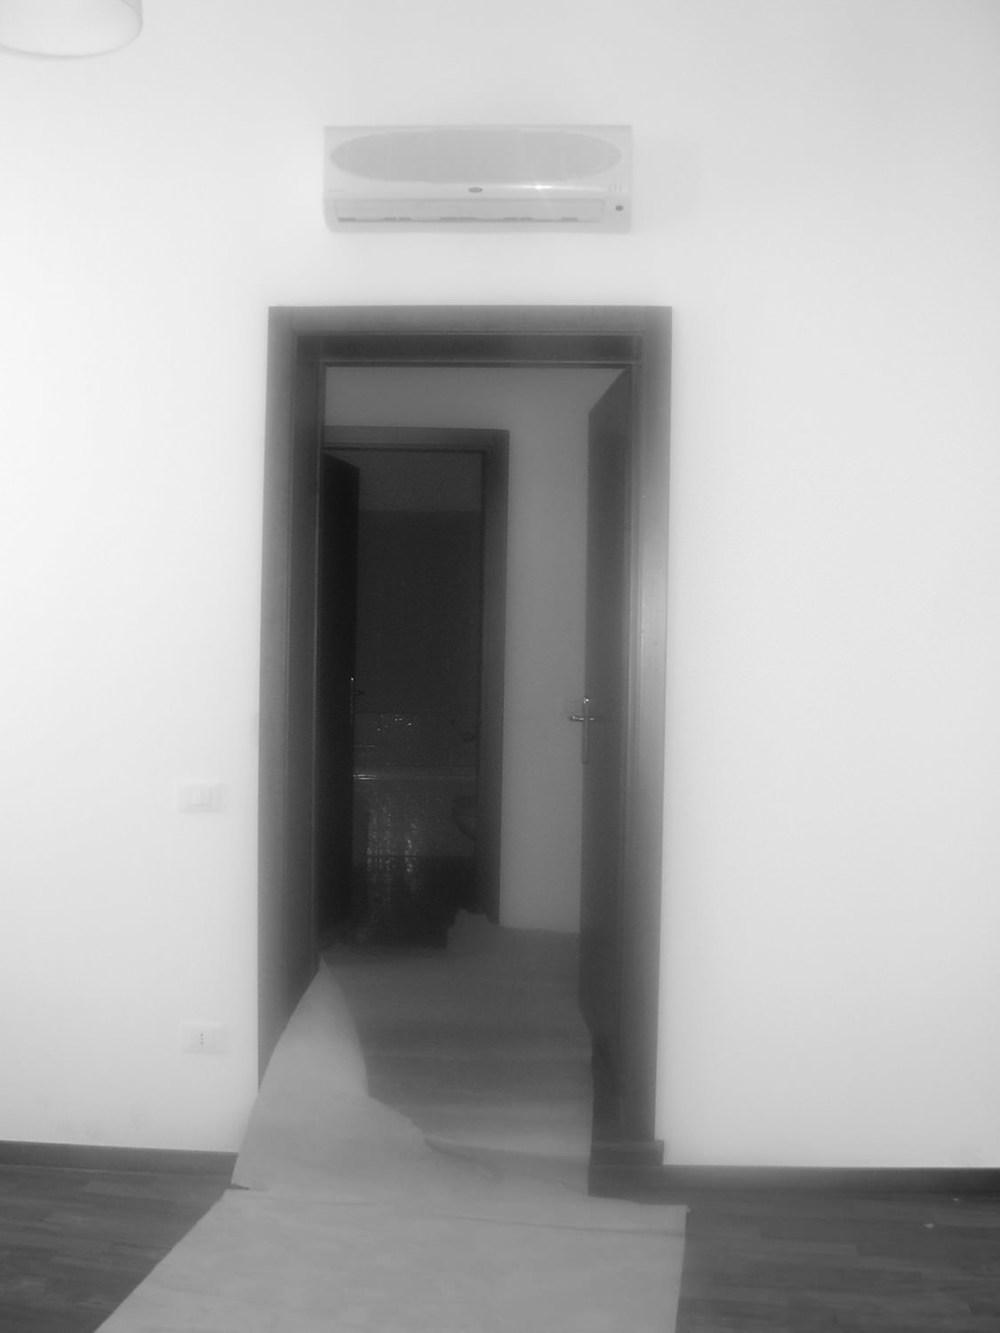 P7300021.jpg